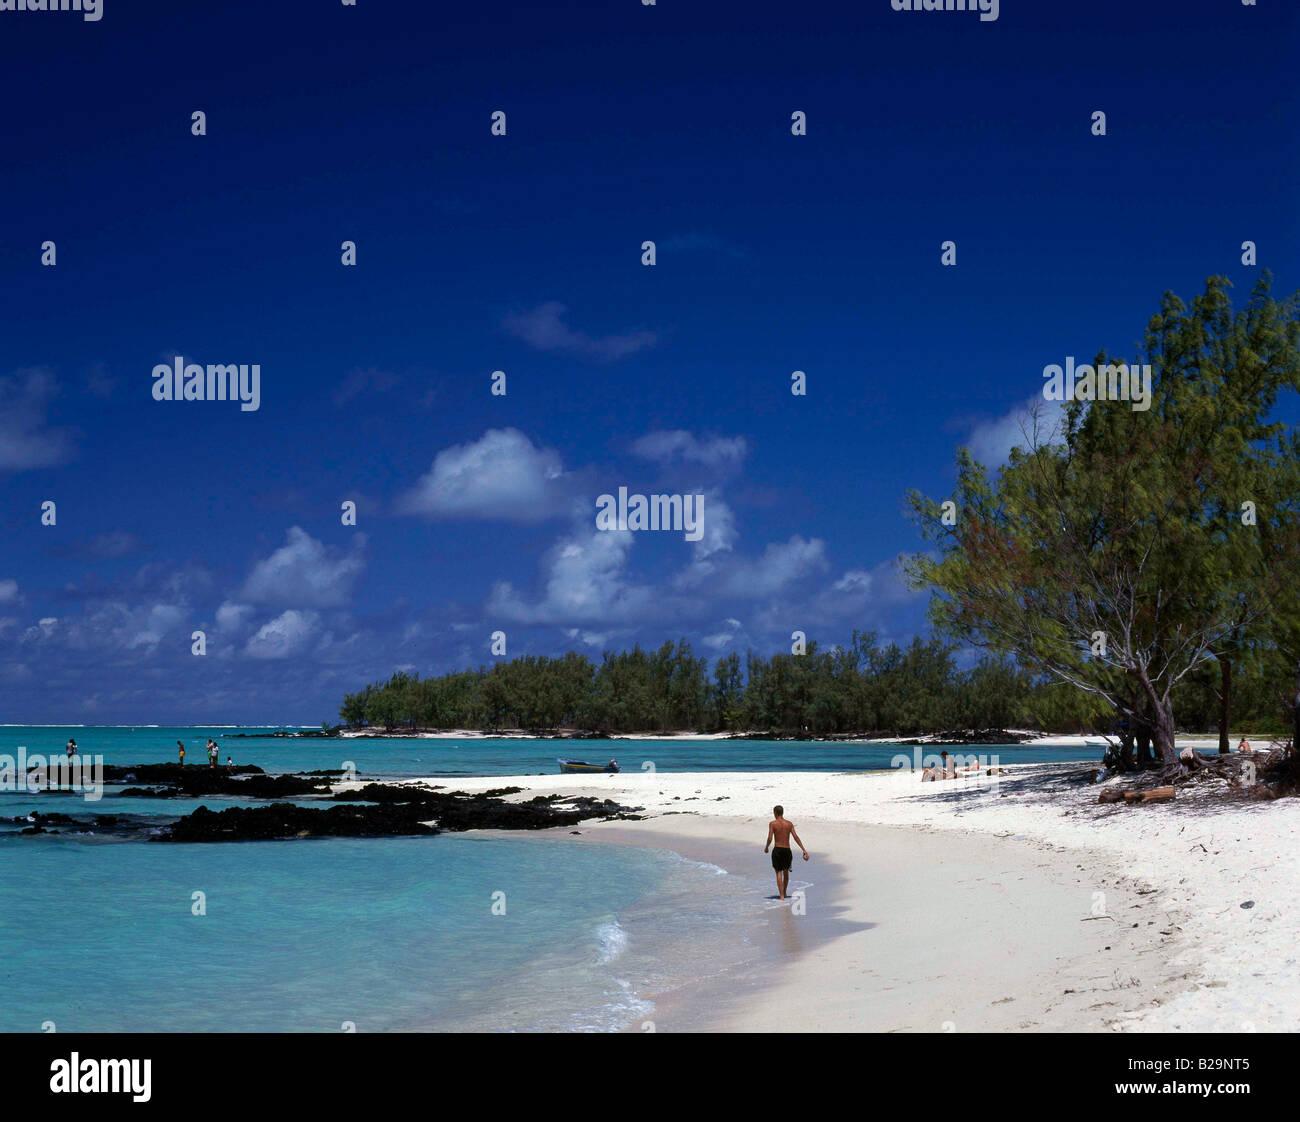 Ile aux Cerfs Mauritius Ref WP DBMAR 210 COMPULSORY CREDIT World Pictures Photoshot - Stock Image